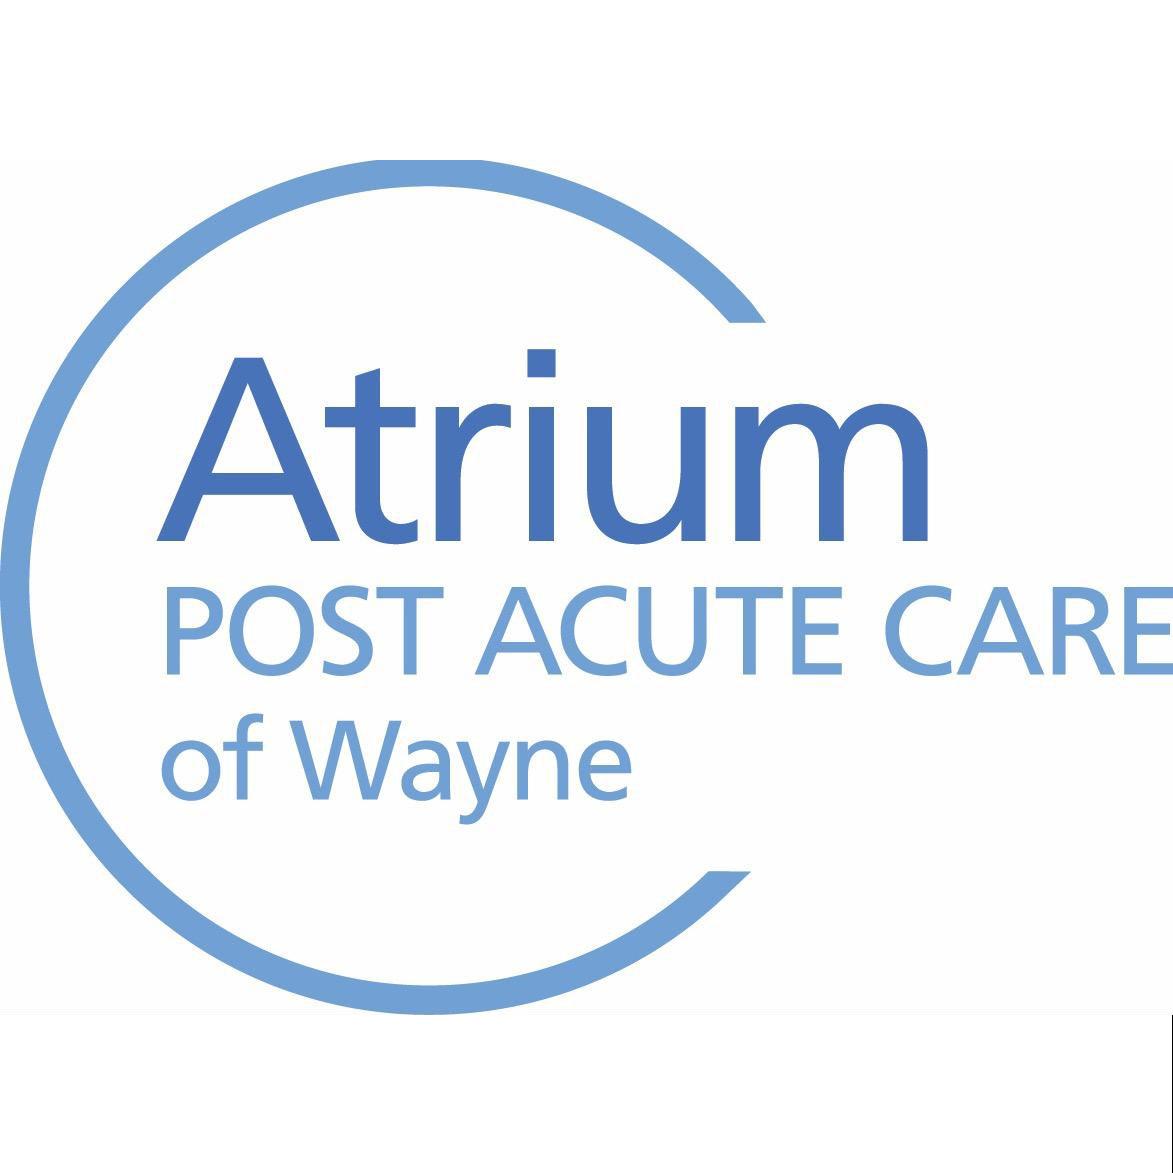 Atrium Post Acute Care of Wayne